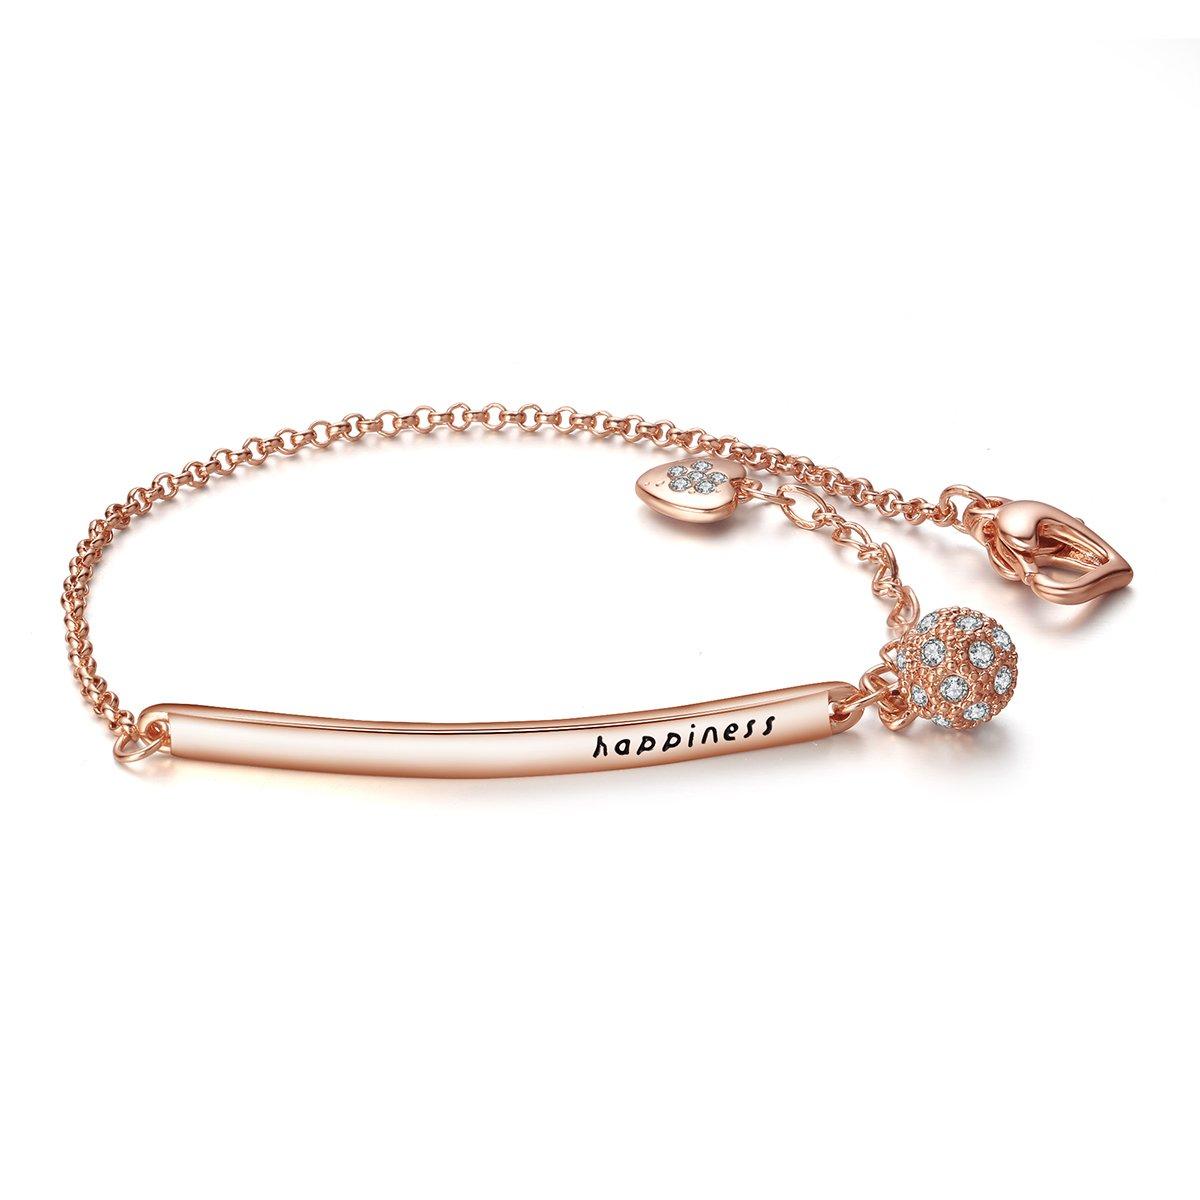 ASHMITA Charm Chain Bracelets for Women Rose Gold CZ Heart Bangle Jewelry Gift …